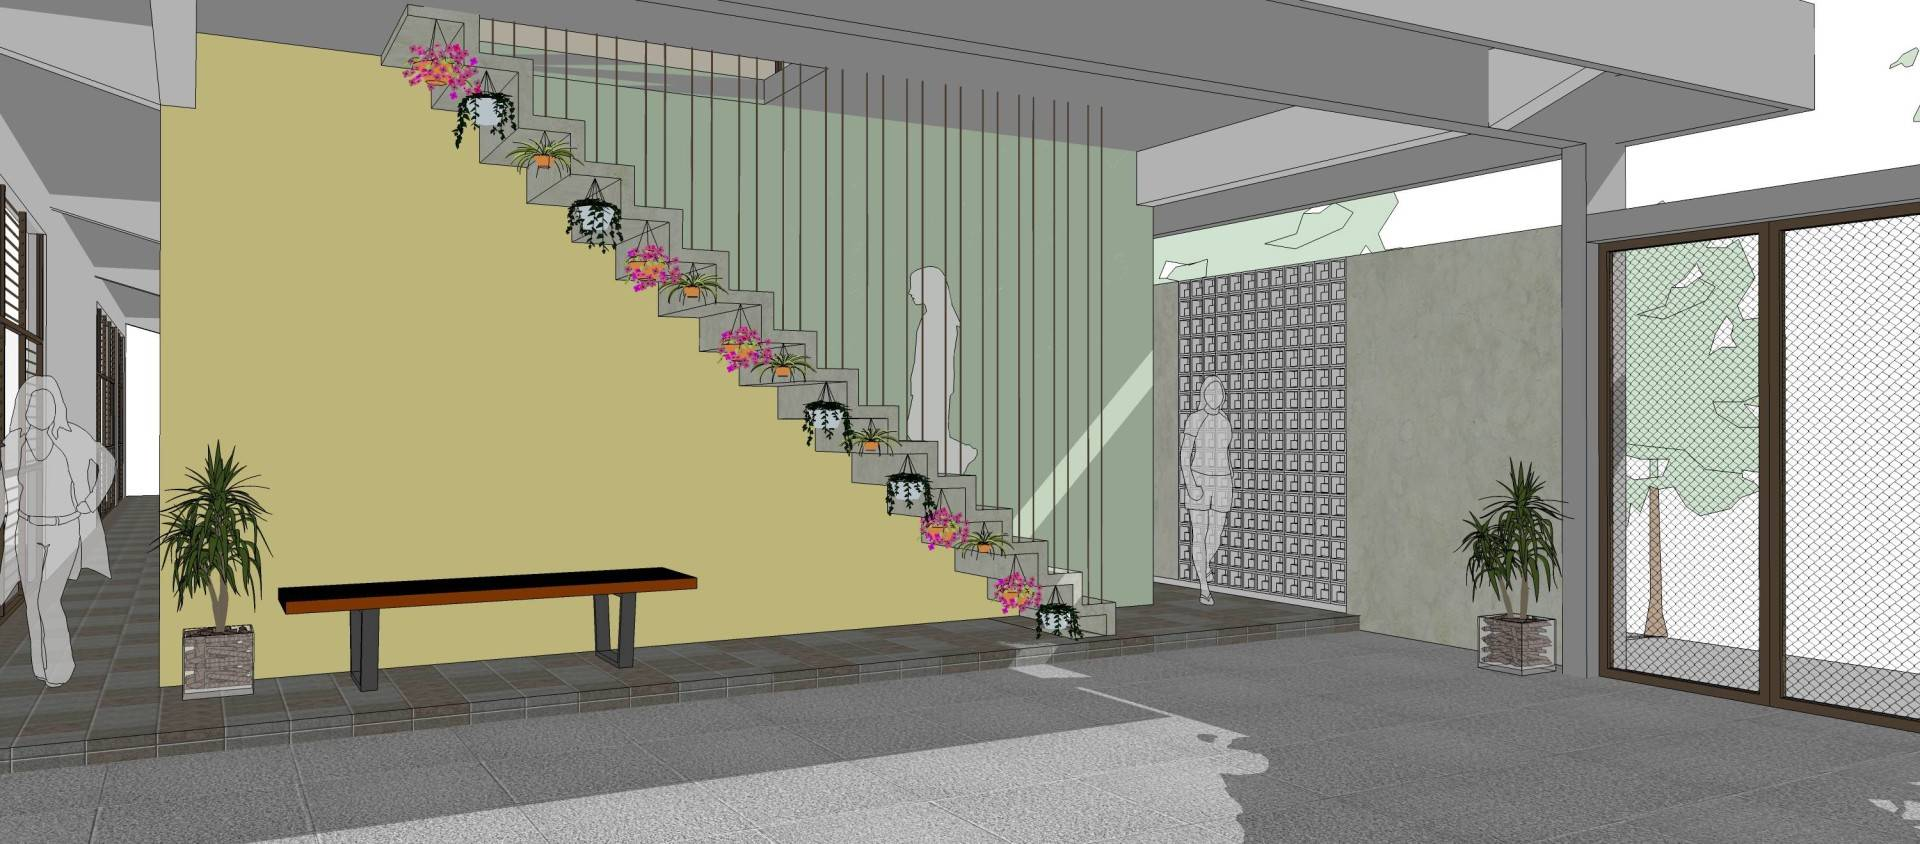 Miv Architects (Ar. Muhammad Ikhsan Hamiru, Iai & Partners) Asrama Mahasiswa Polewali Mandar Di Makassar   With Pt.dap Makassar, Sulawesi Selatan, Indonesia Makassar, Sulawesi Selatan, Indonesia Stairs Modern, Tropis  5025